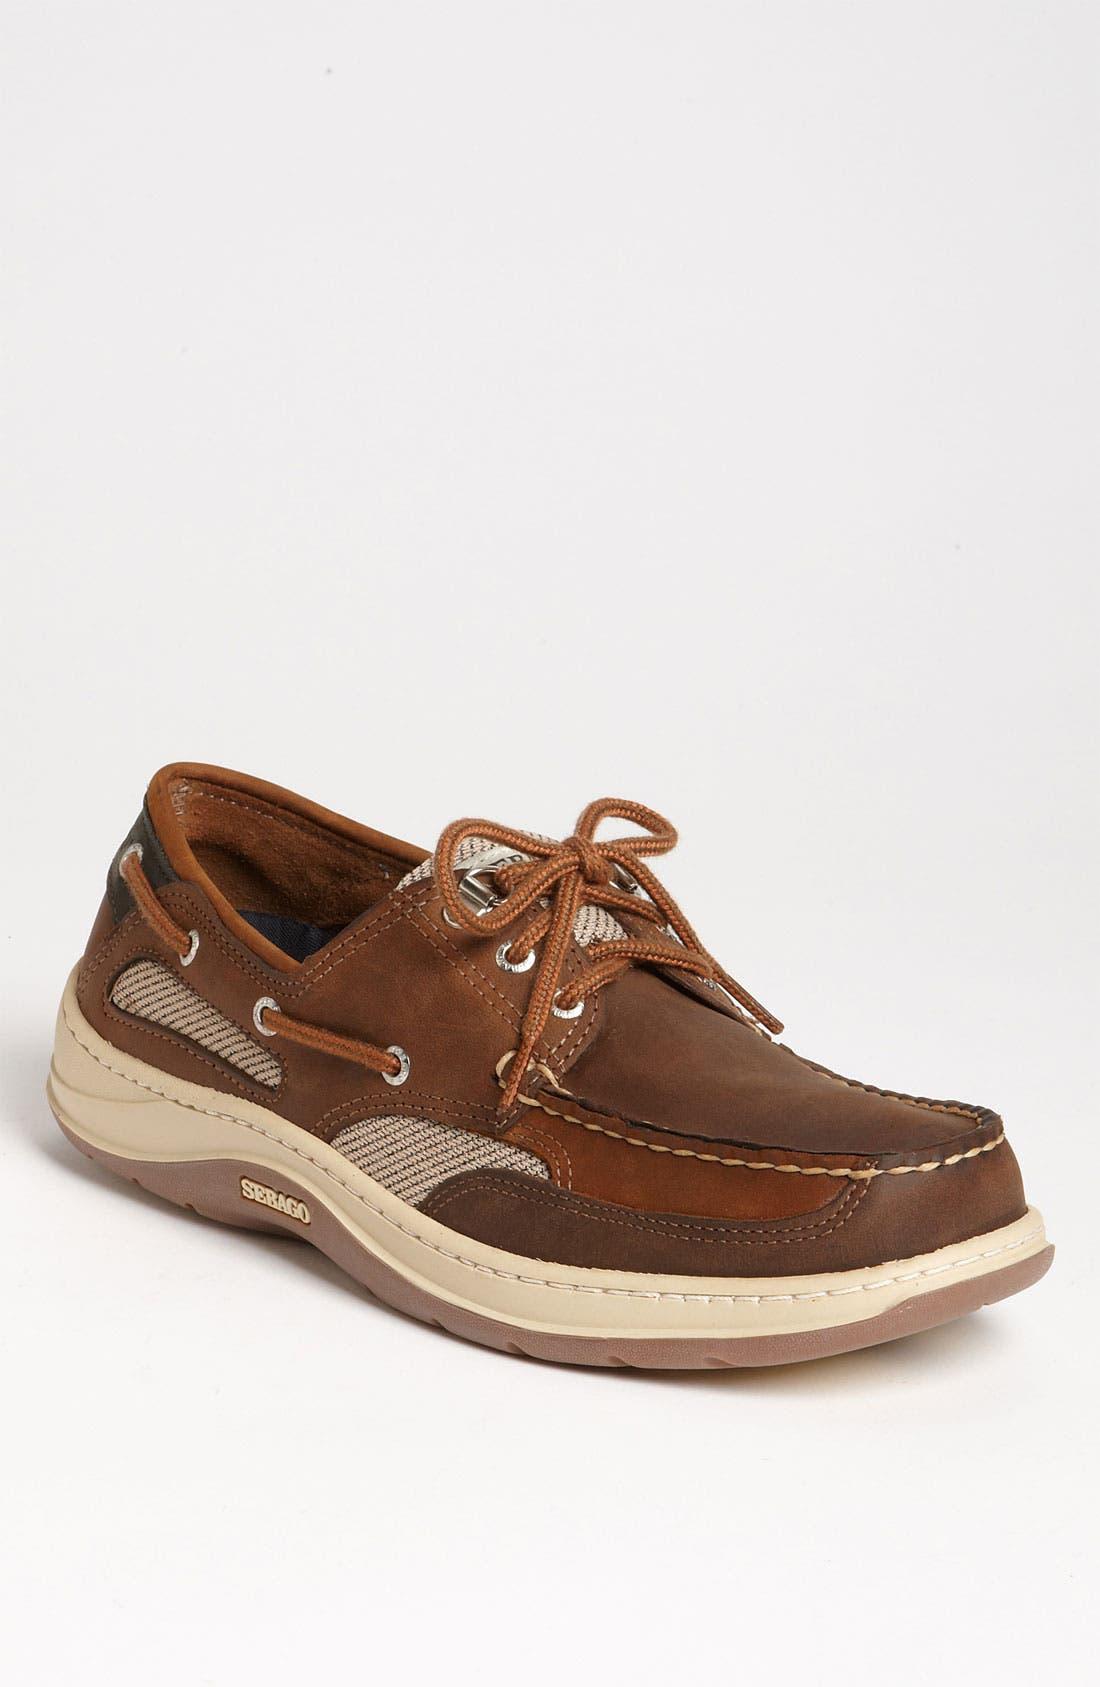 Alternate Image 1 Selected - Sebago 'Clovehitch II' Boat Shoe